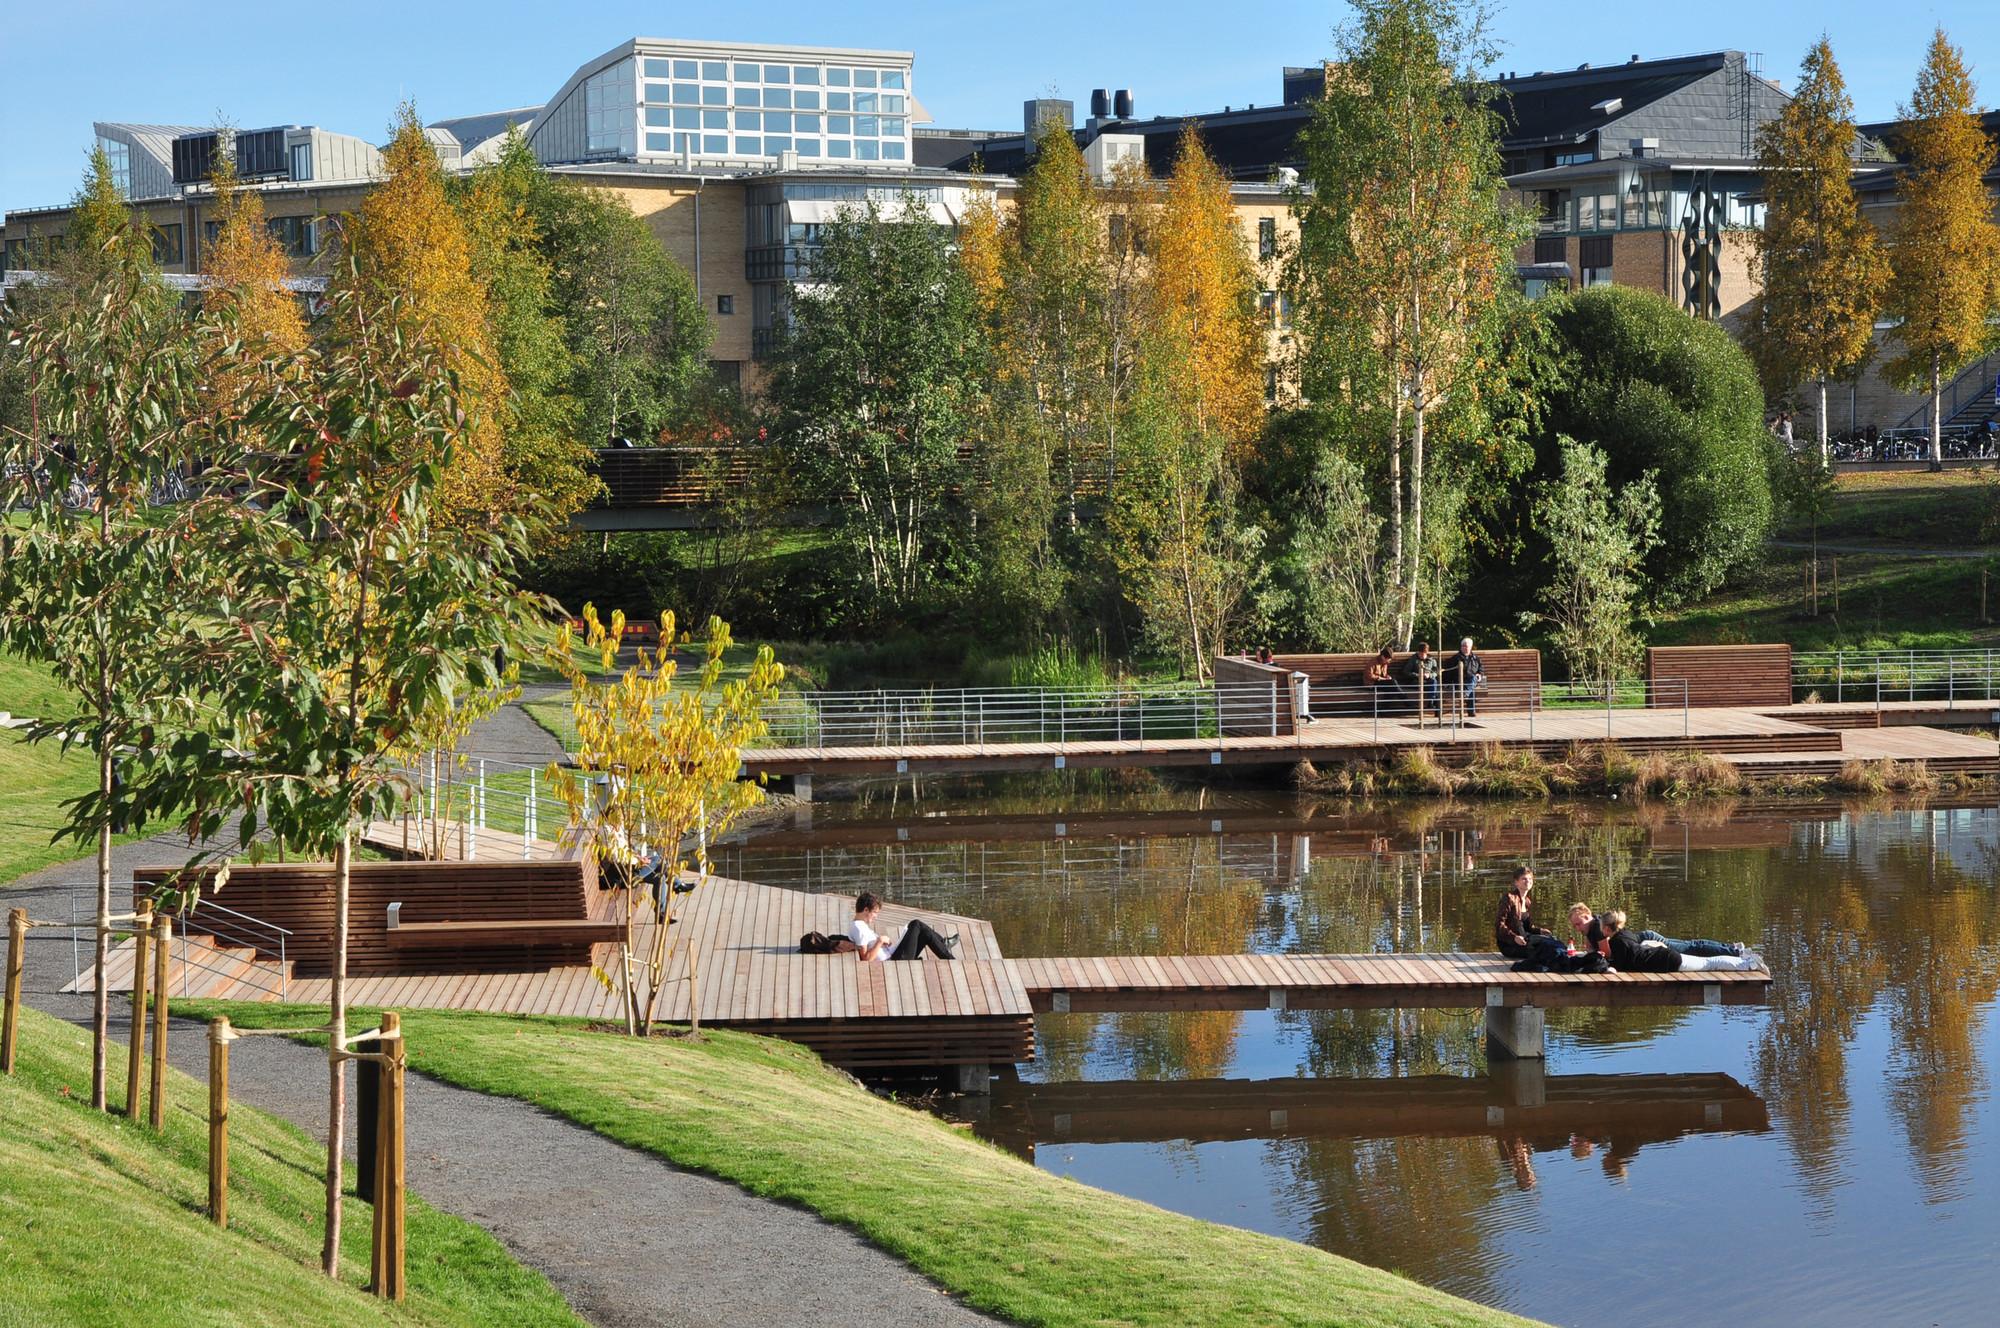 Umeå Campus Park / Thorbjörn Andersson + Sweco Architects, Courtesy of Thorbjörn Andersson + Sweco Architects